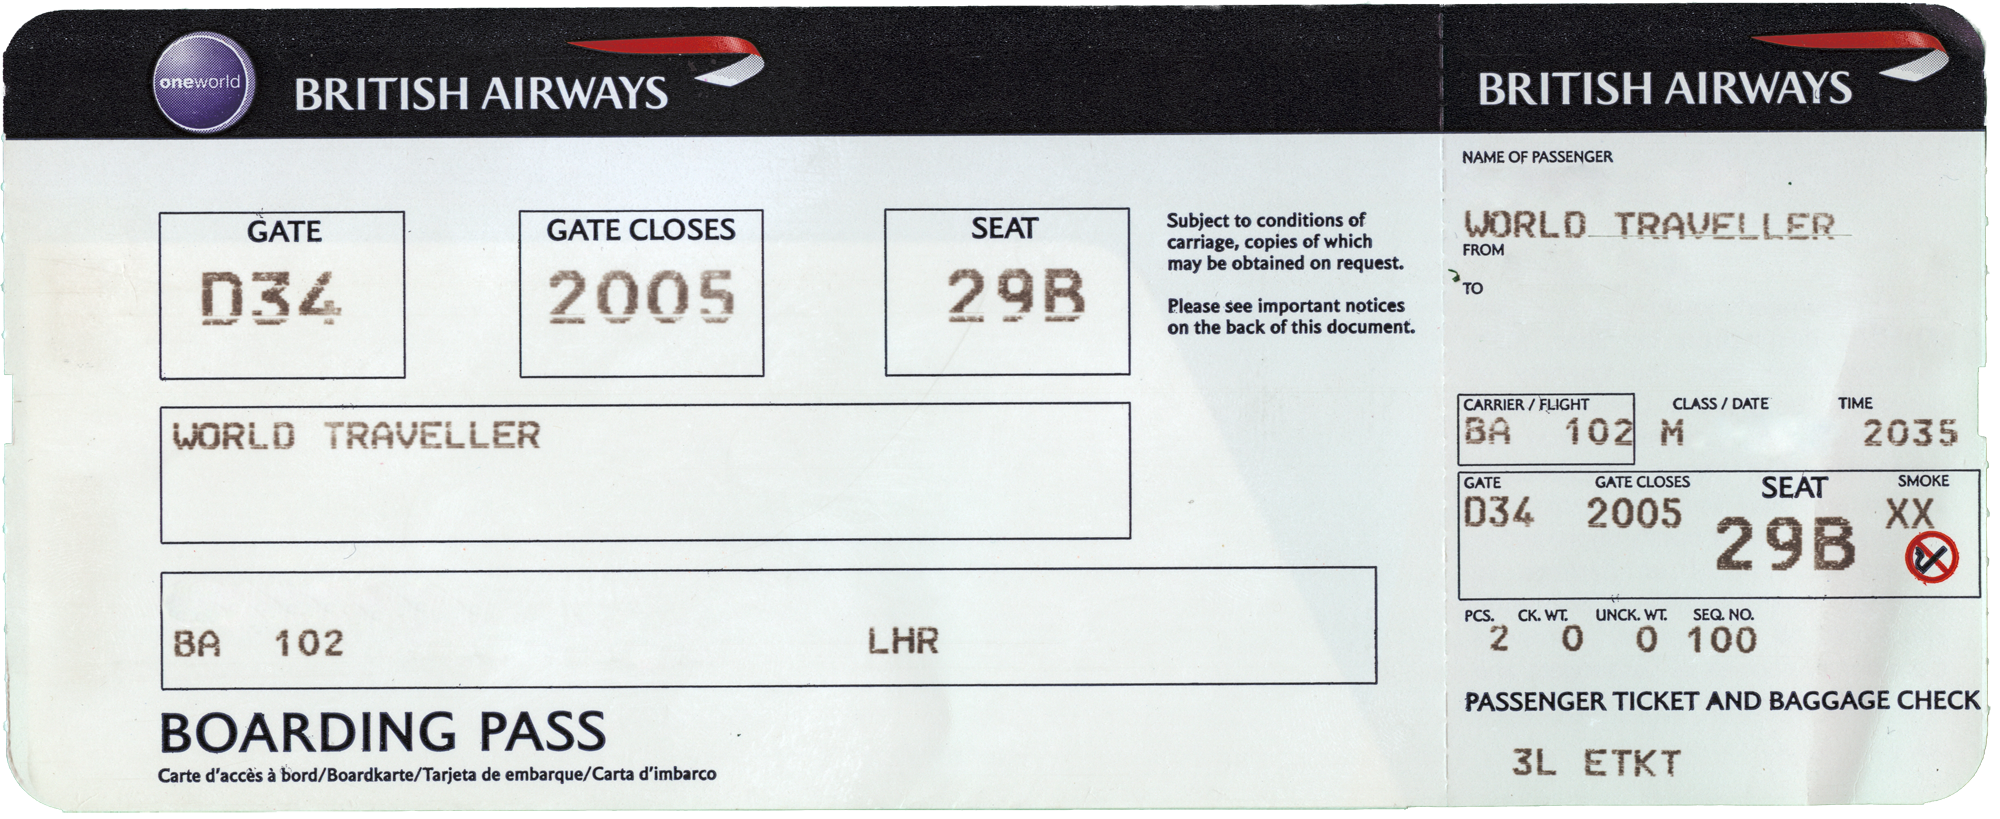 blank plane ticket clipart clipart kid ticket plane ticket wedding results smallgeneric raffle ticket ticket